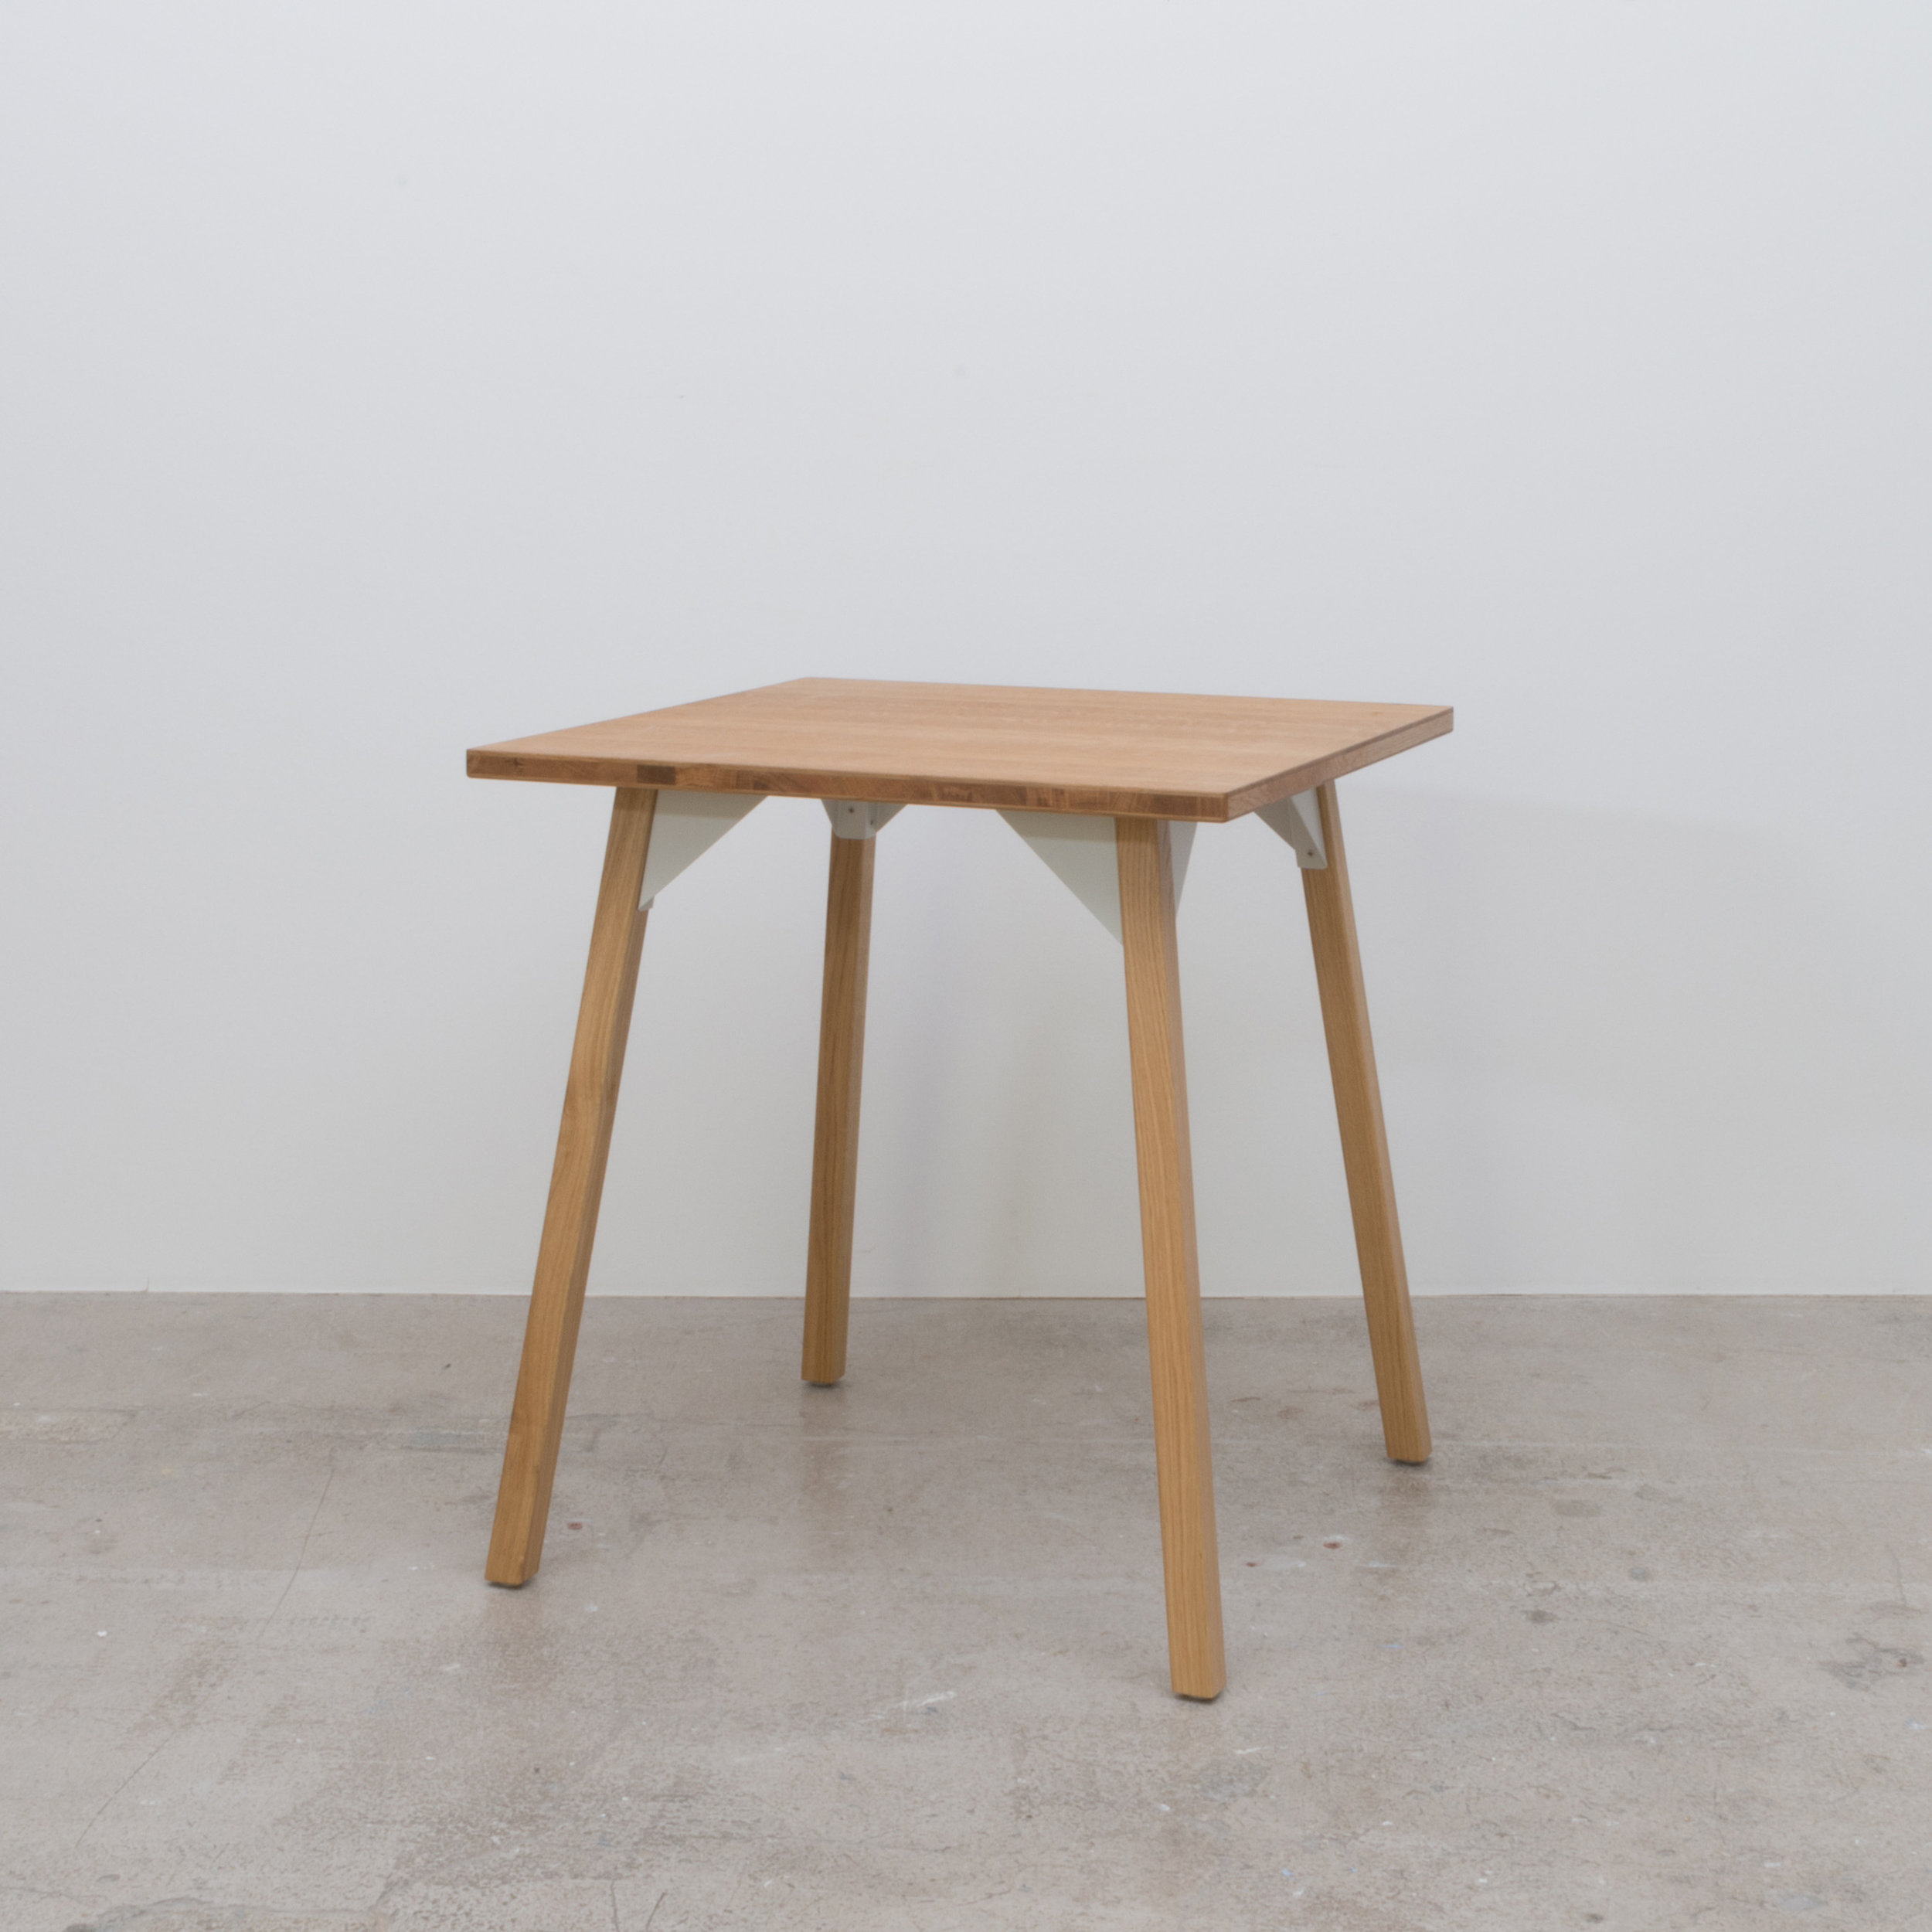 Oak Table 700 x 700 x740H